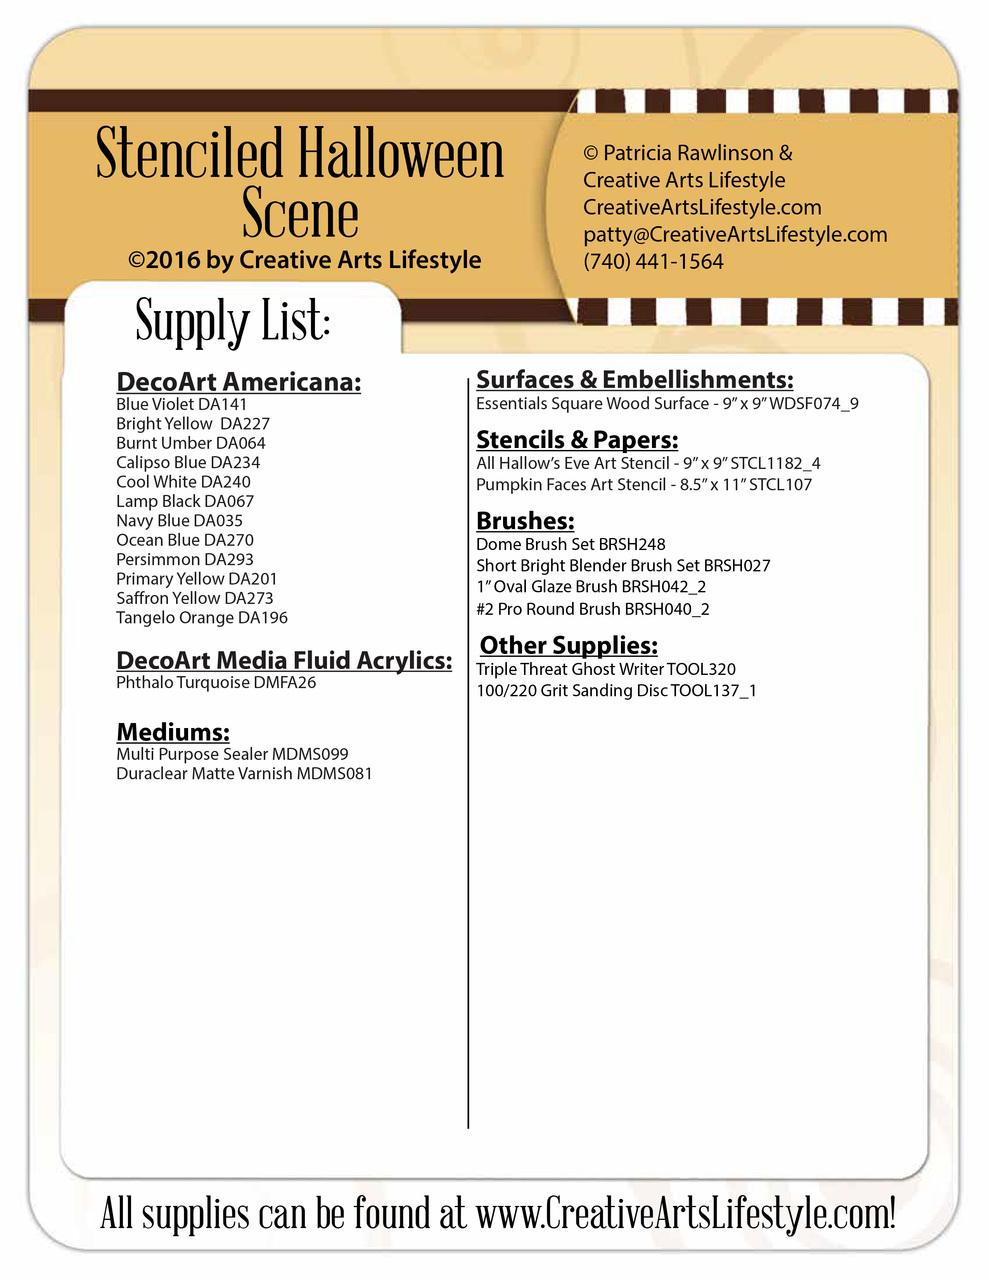 Stenciled Halloween Scene - E-Packet - Patricia Rawlinson